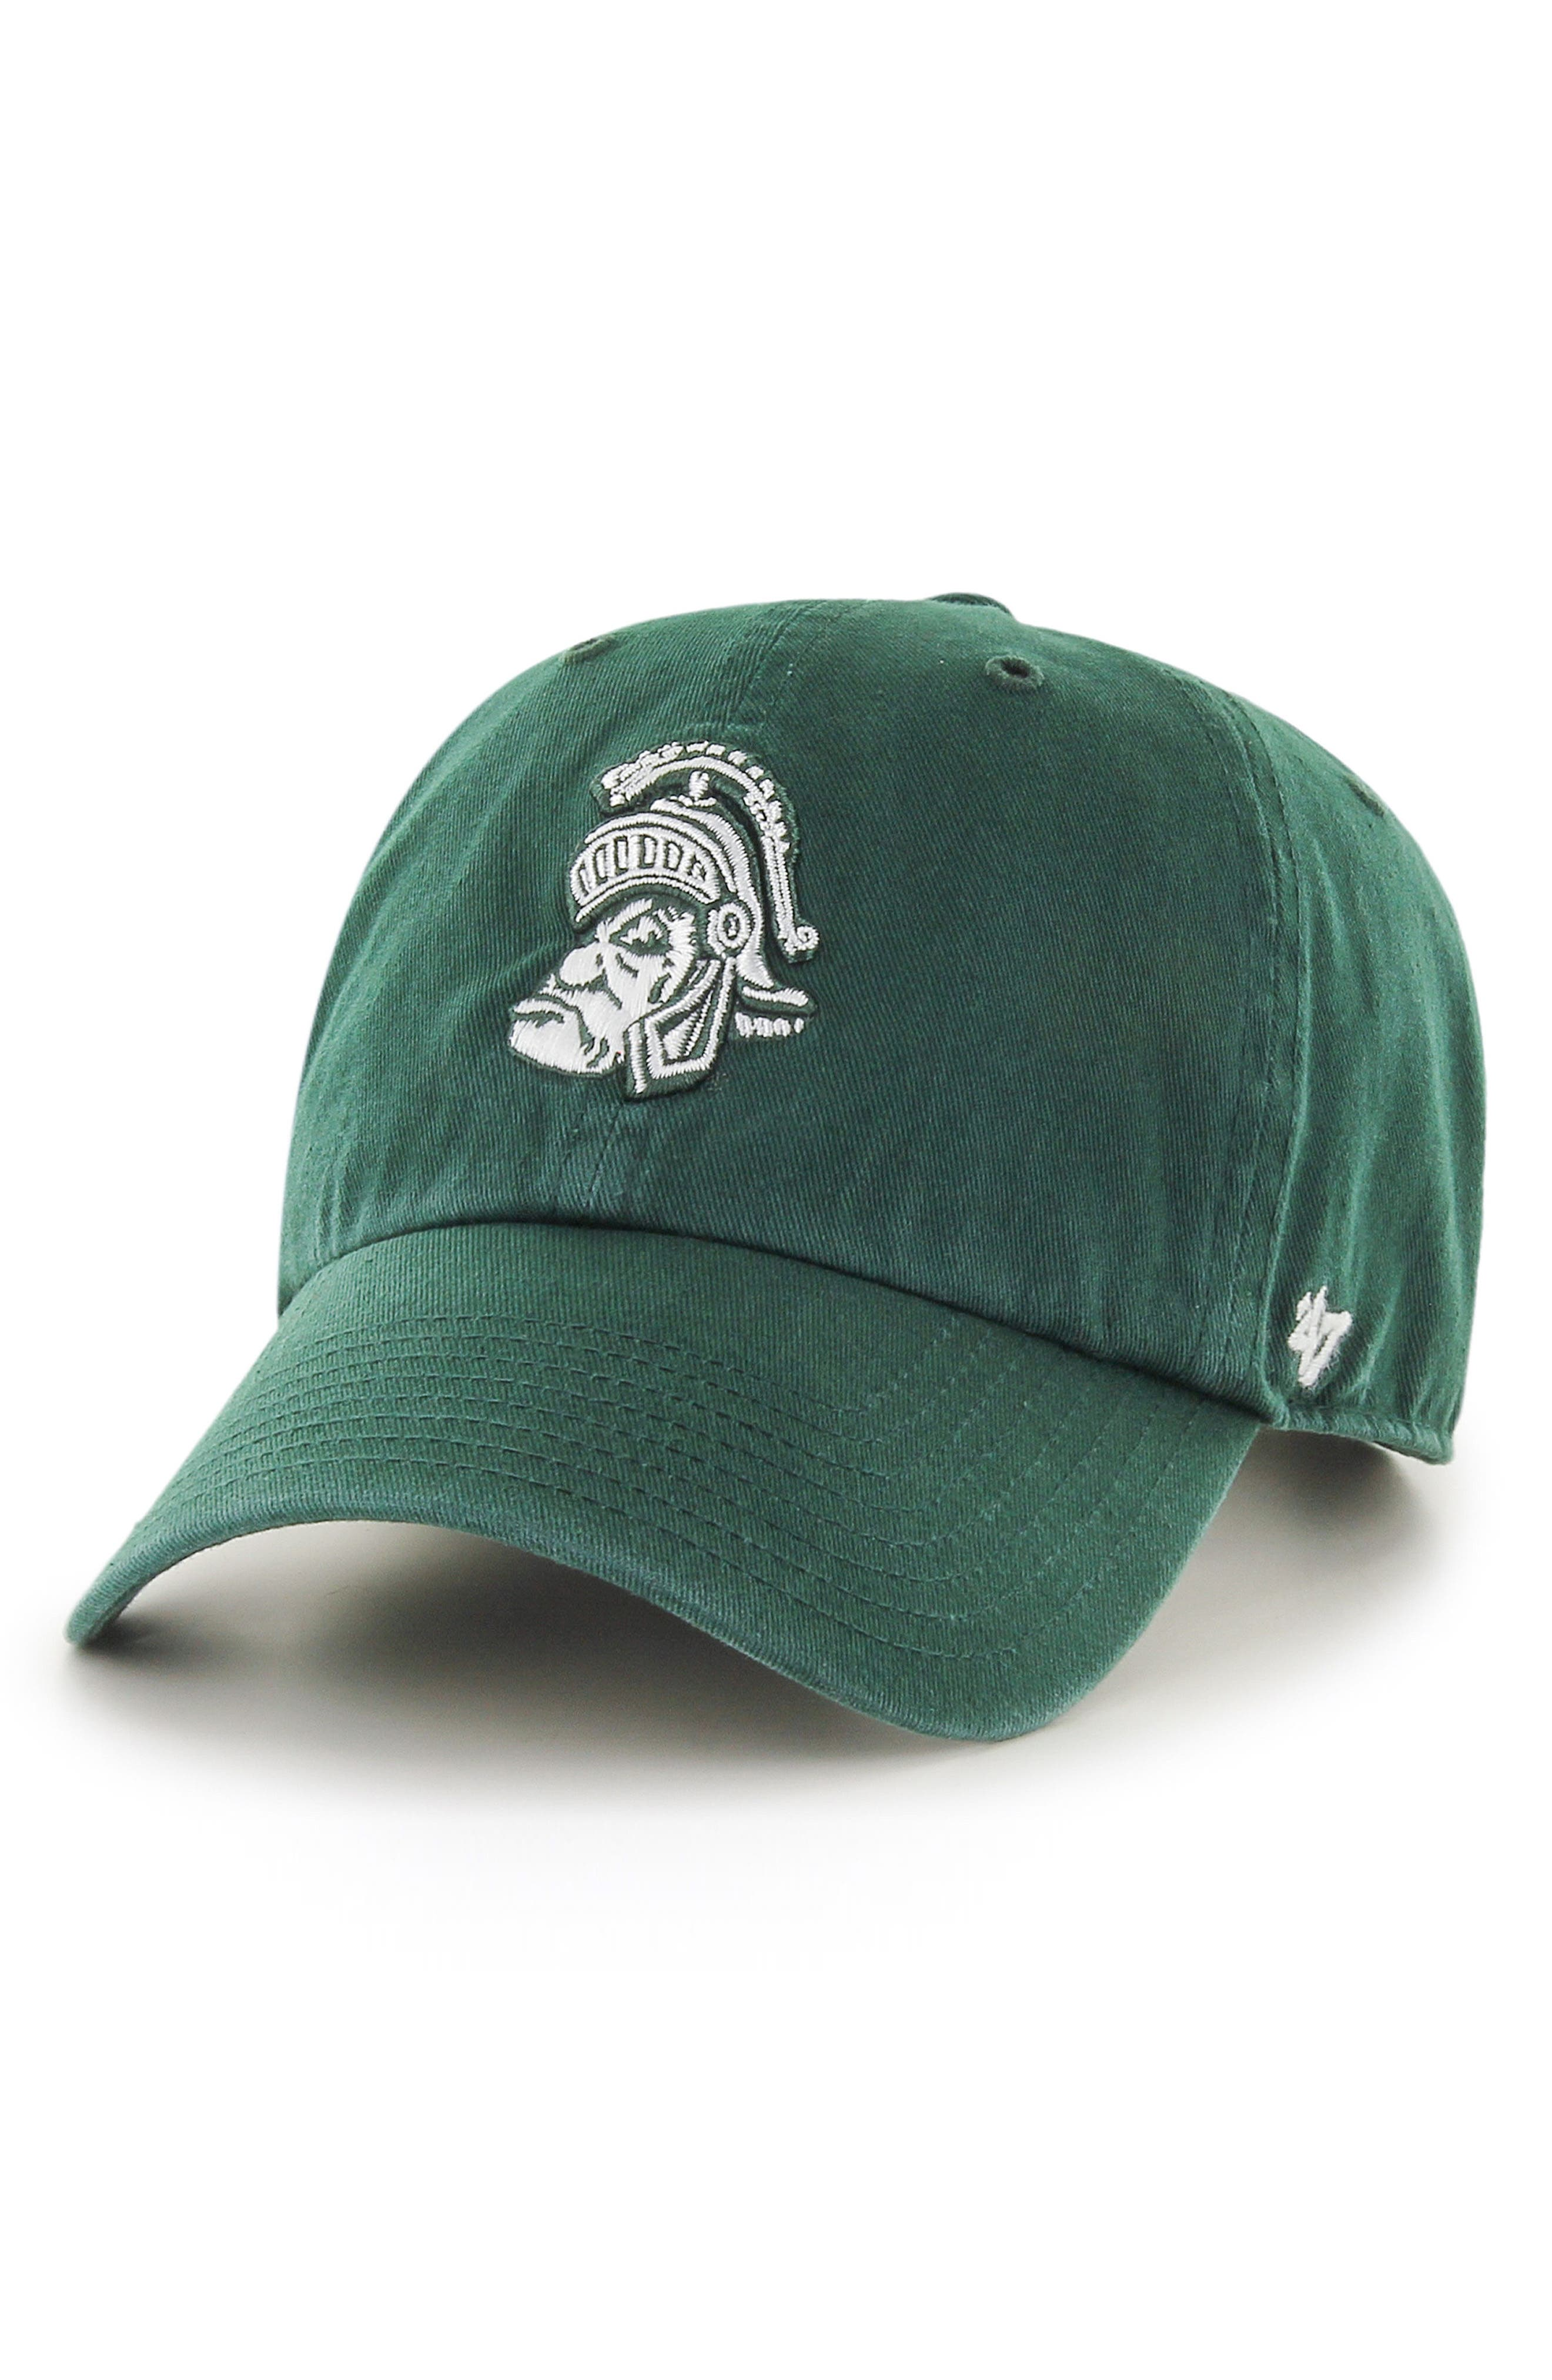 low priced 427fd 76570 hot 47 brand collegiate clean up michigan state spartans ball cap 6e900  03954